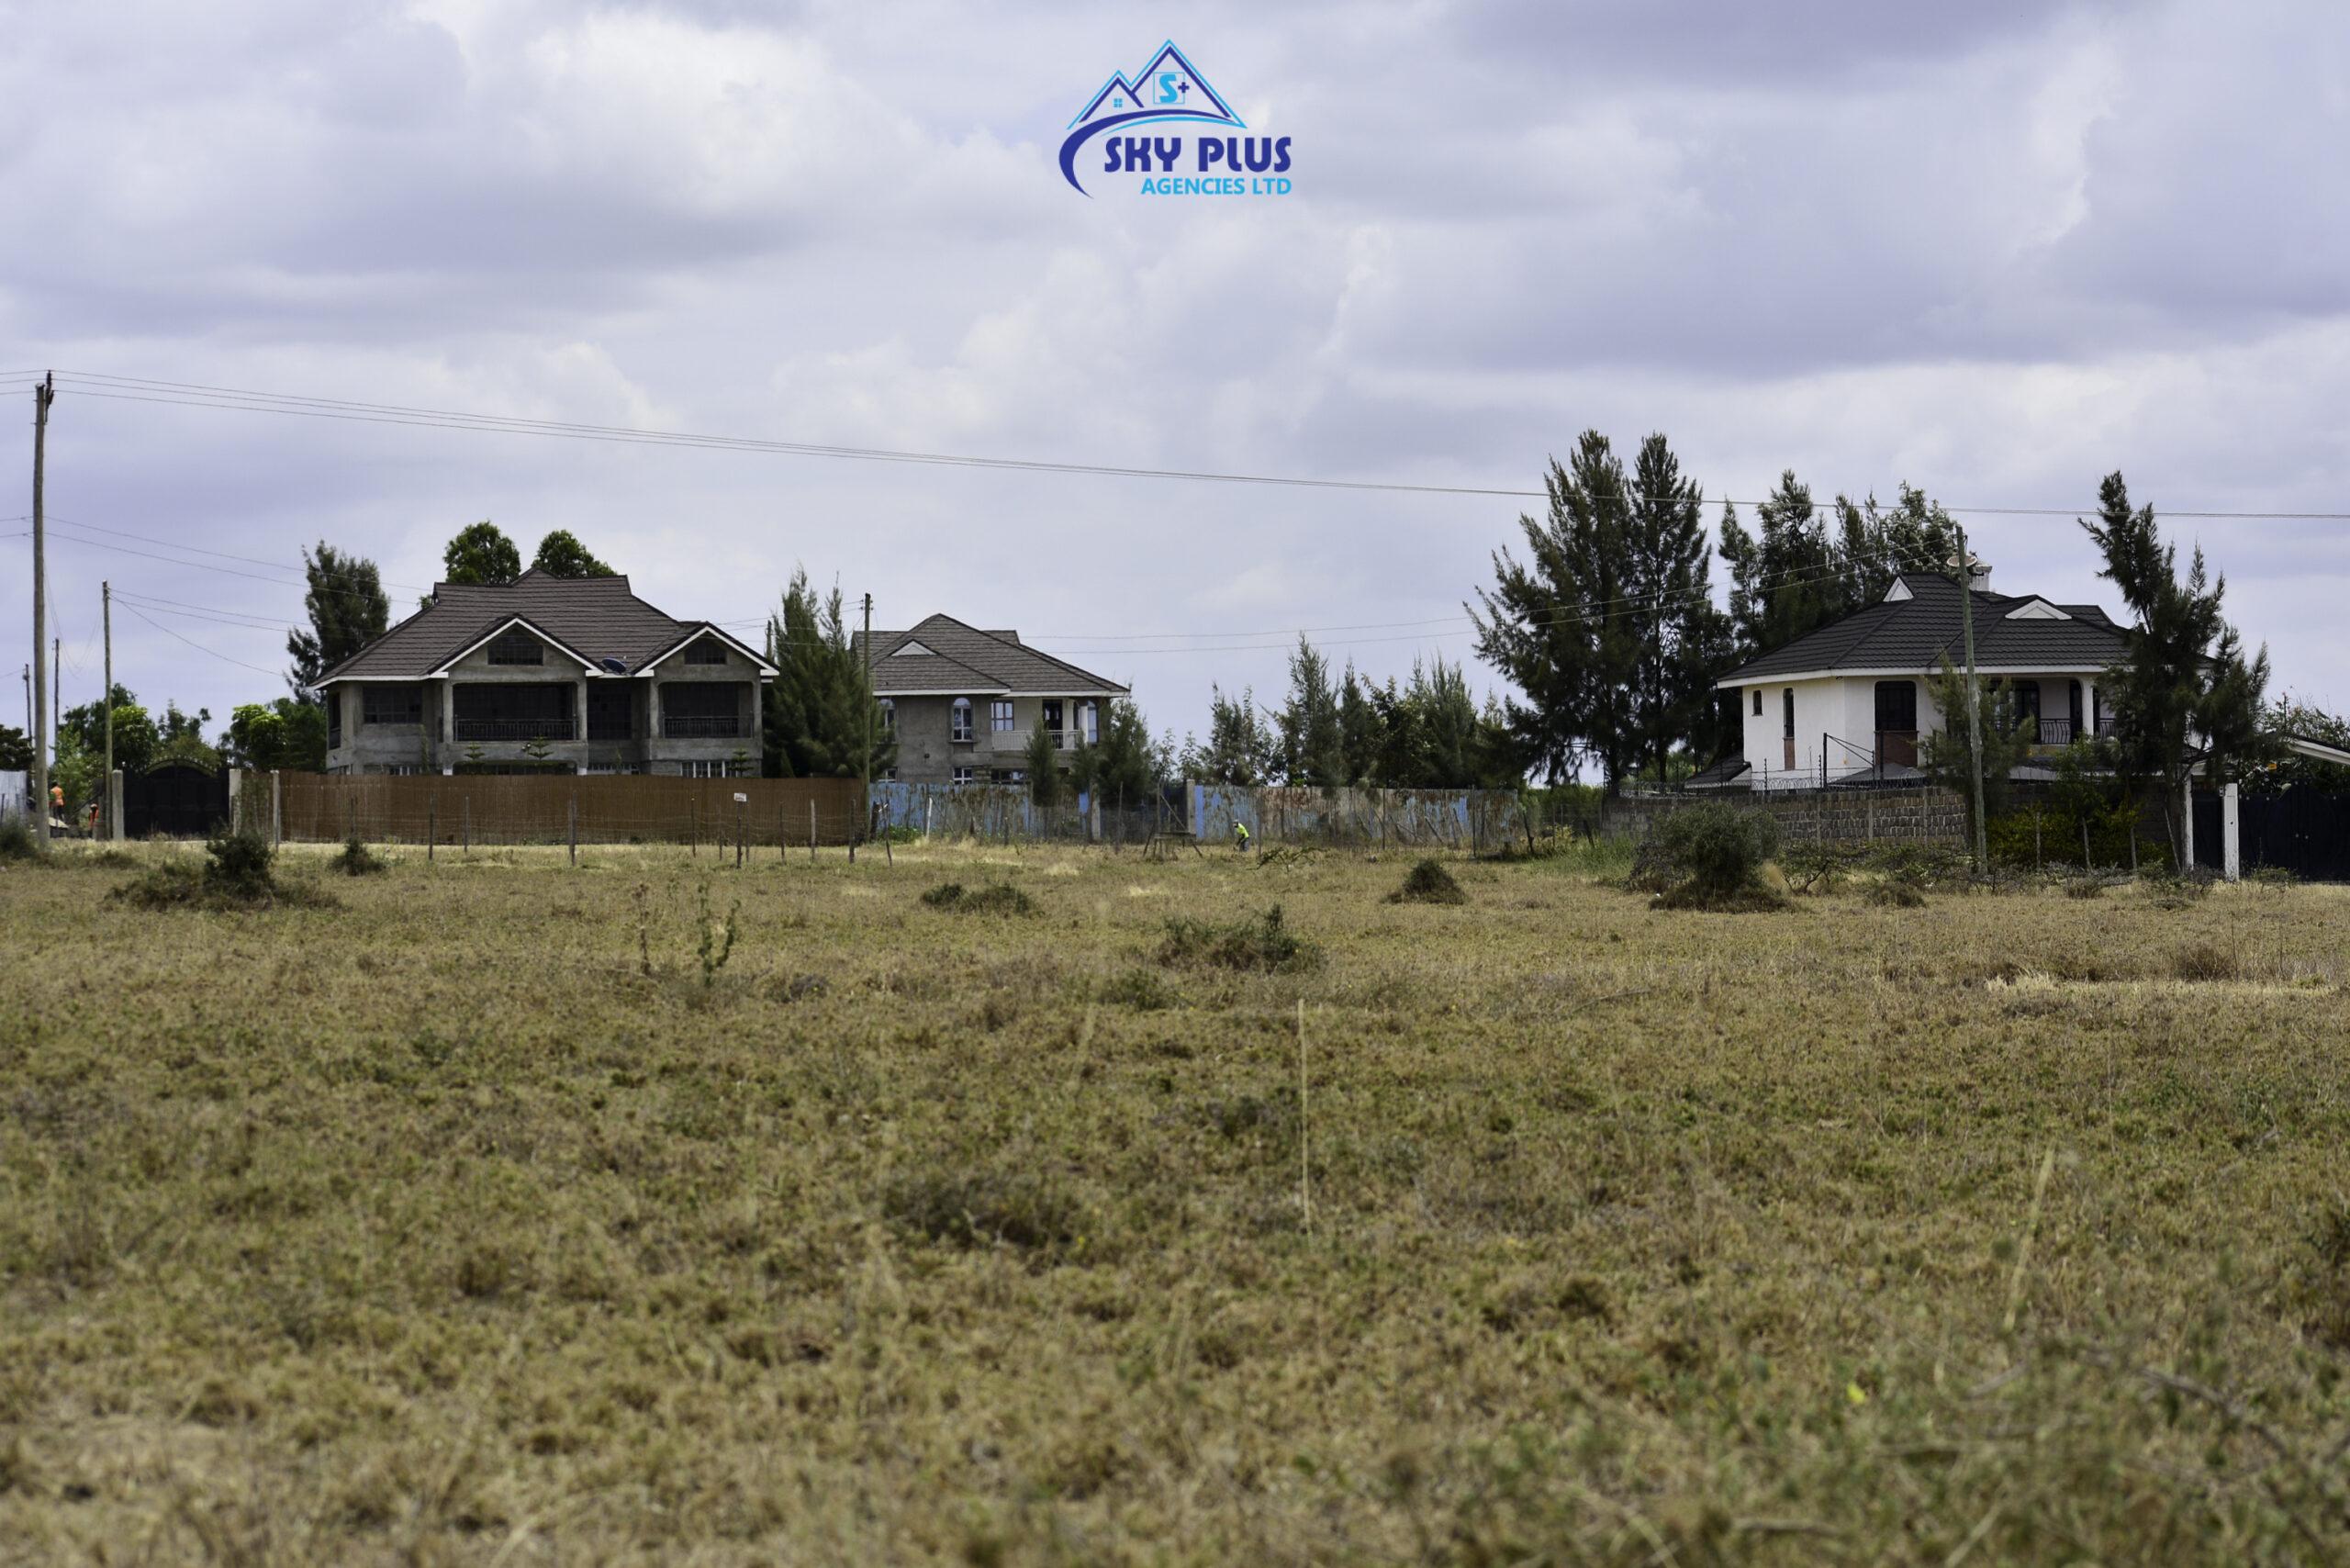 1/8 Acre Plots FOR SALE in Kitengela, behind KAG University